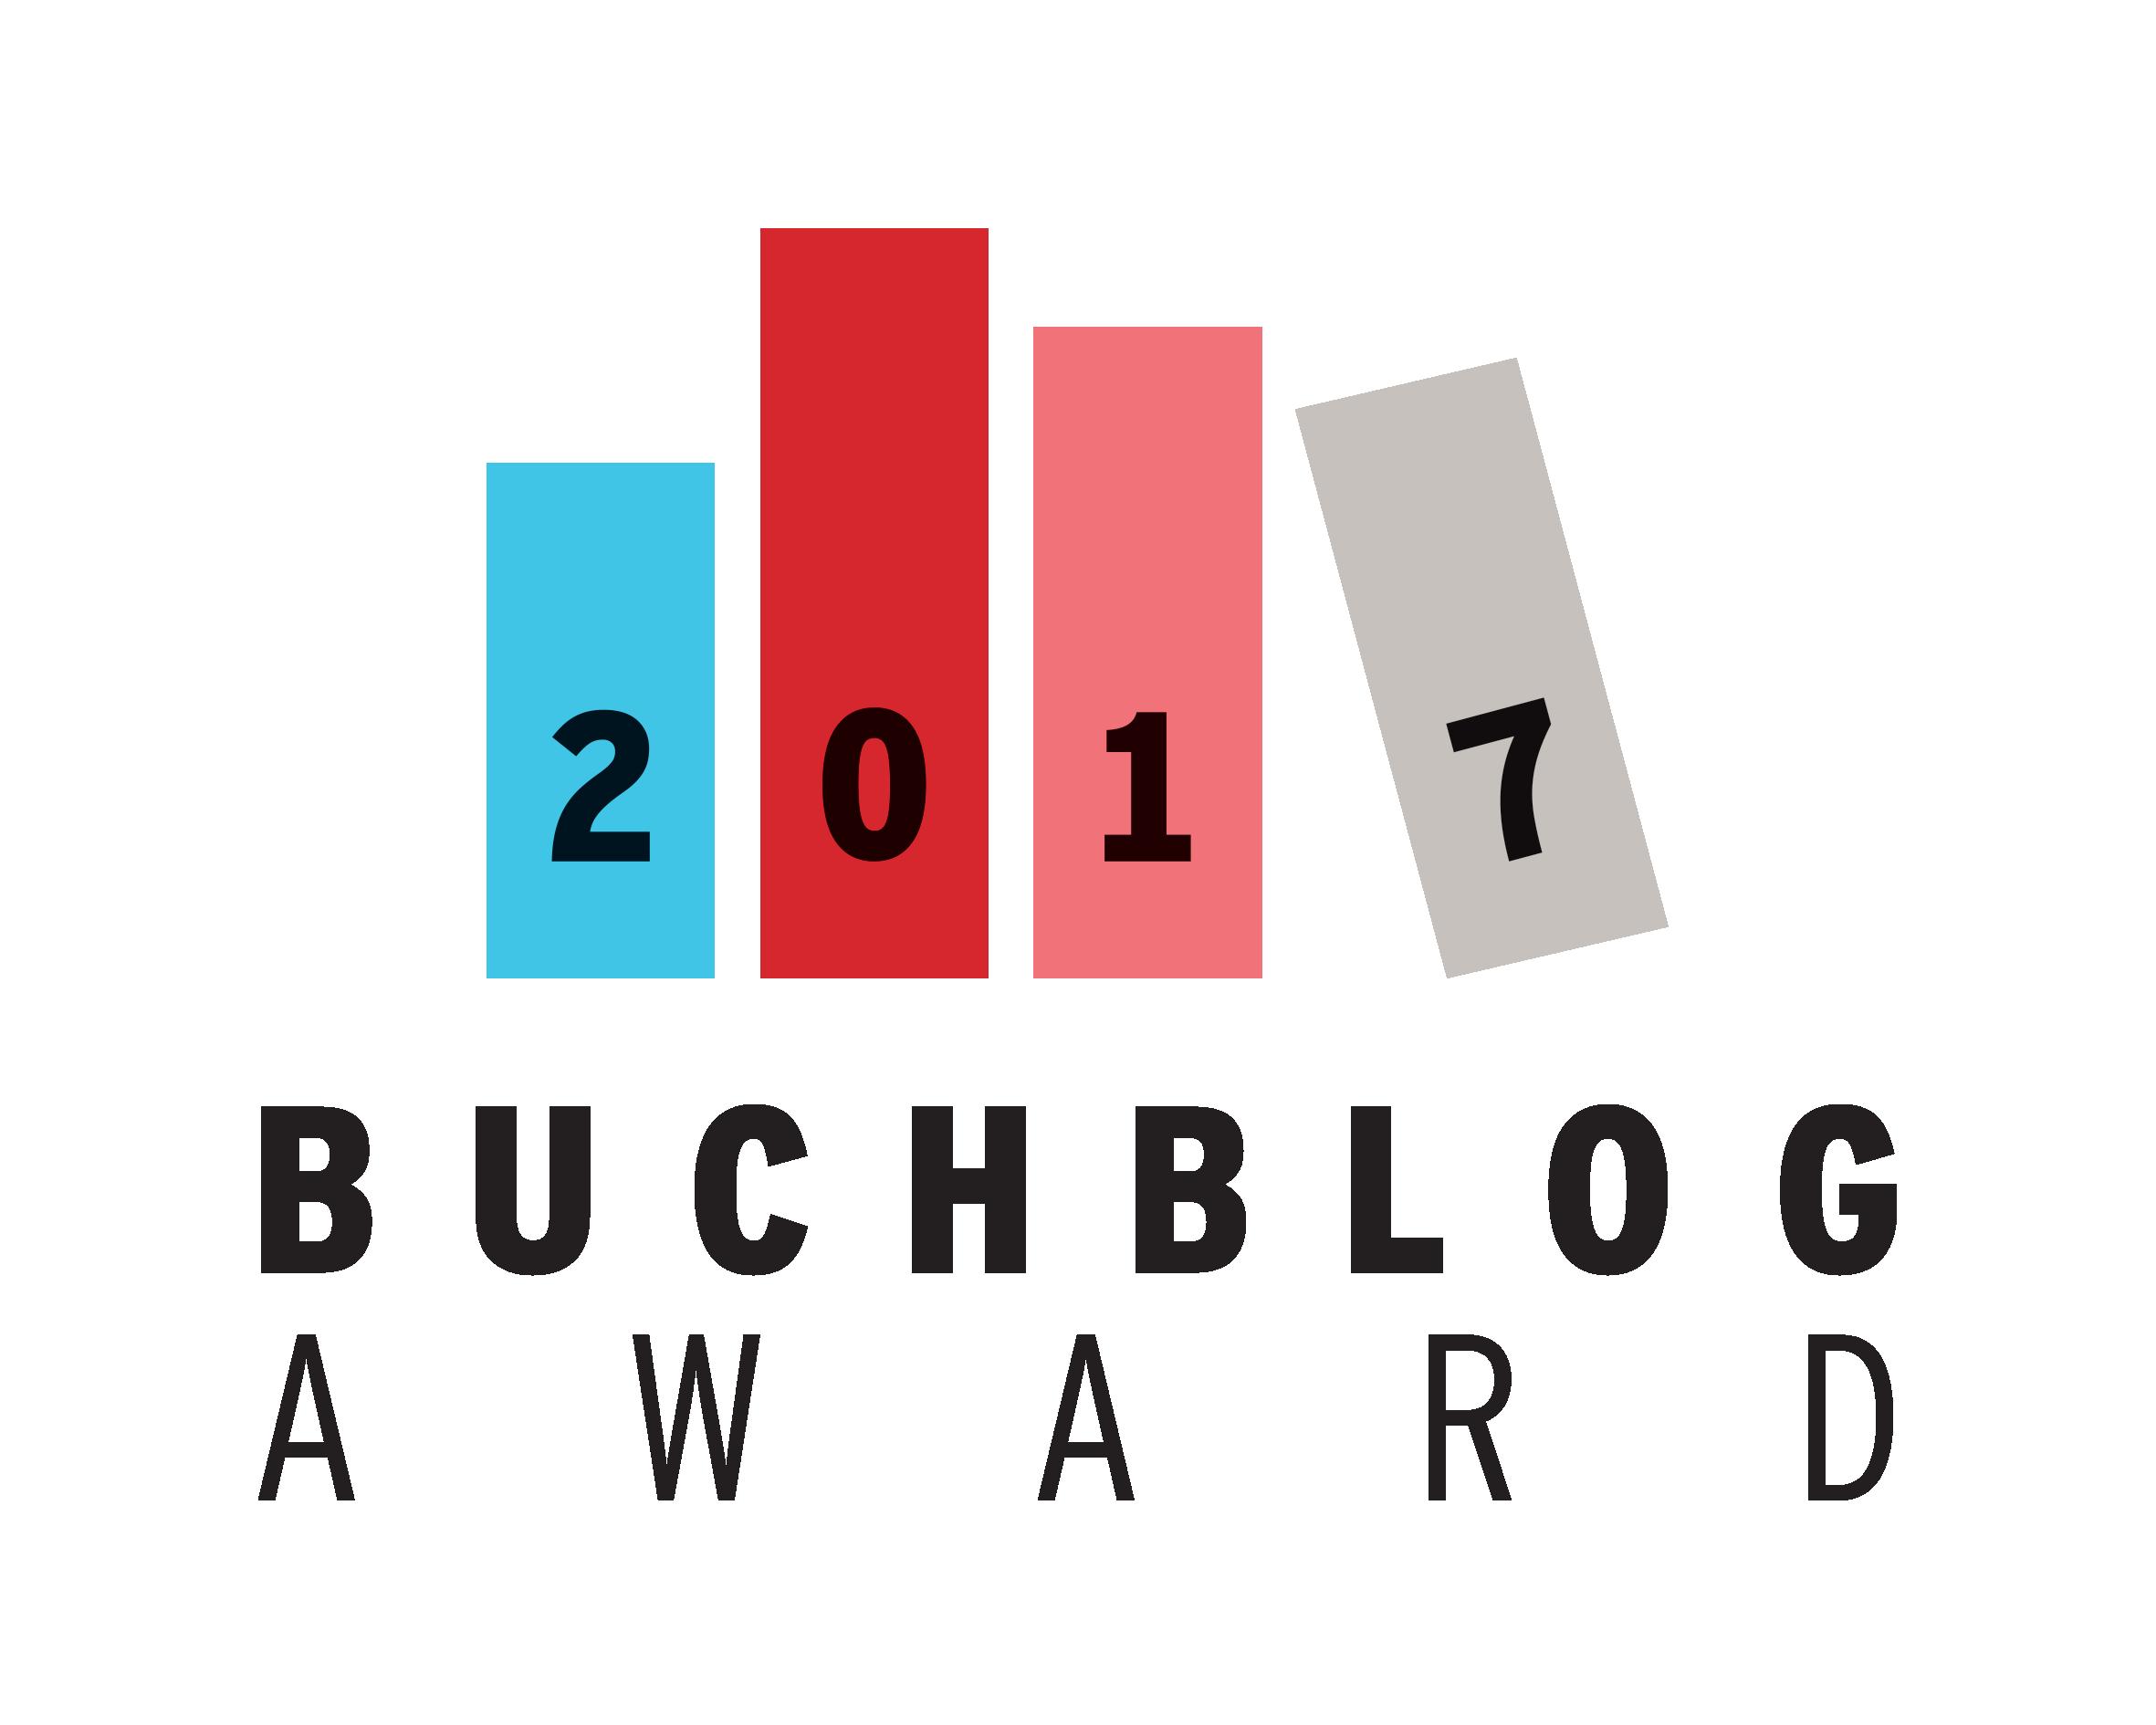 Preisverleihung Buchblog-Award 2017 #bubla17